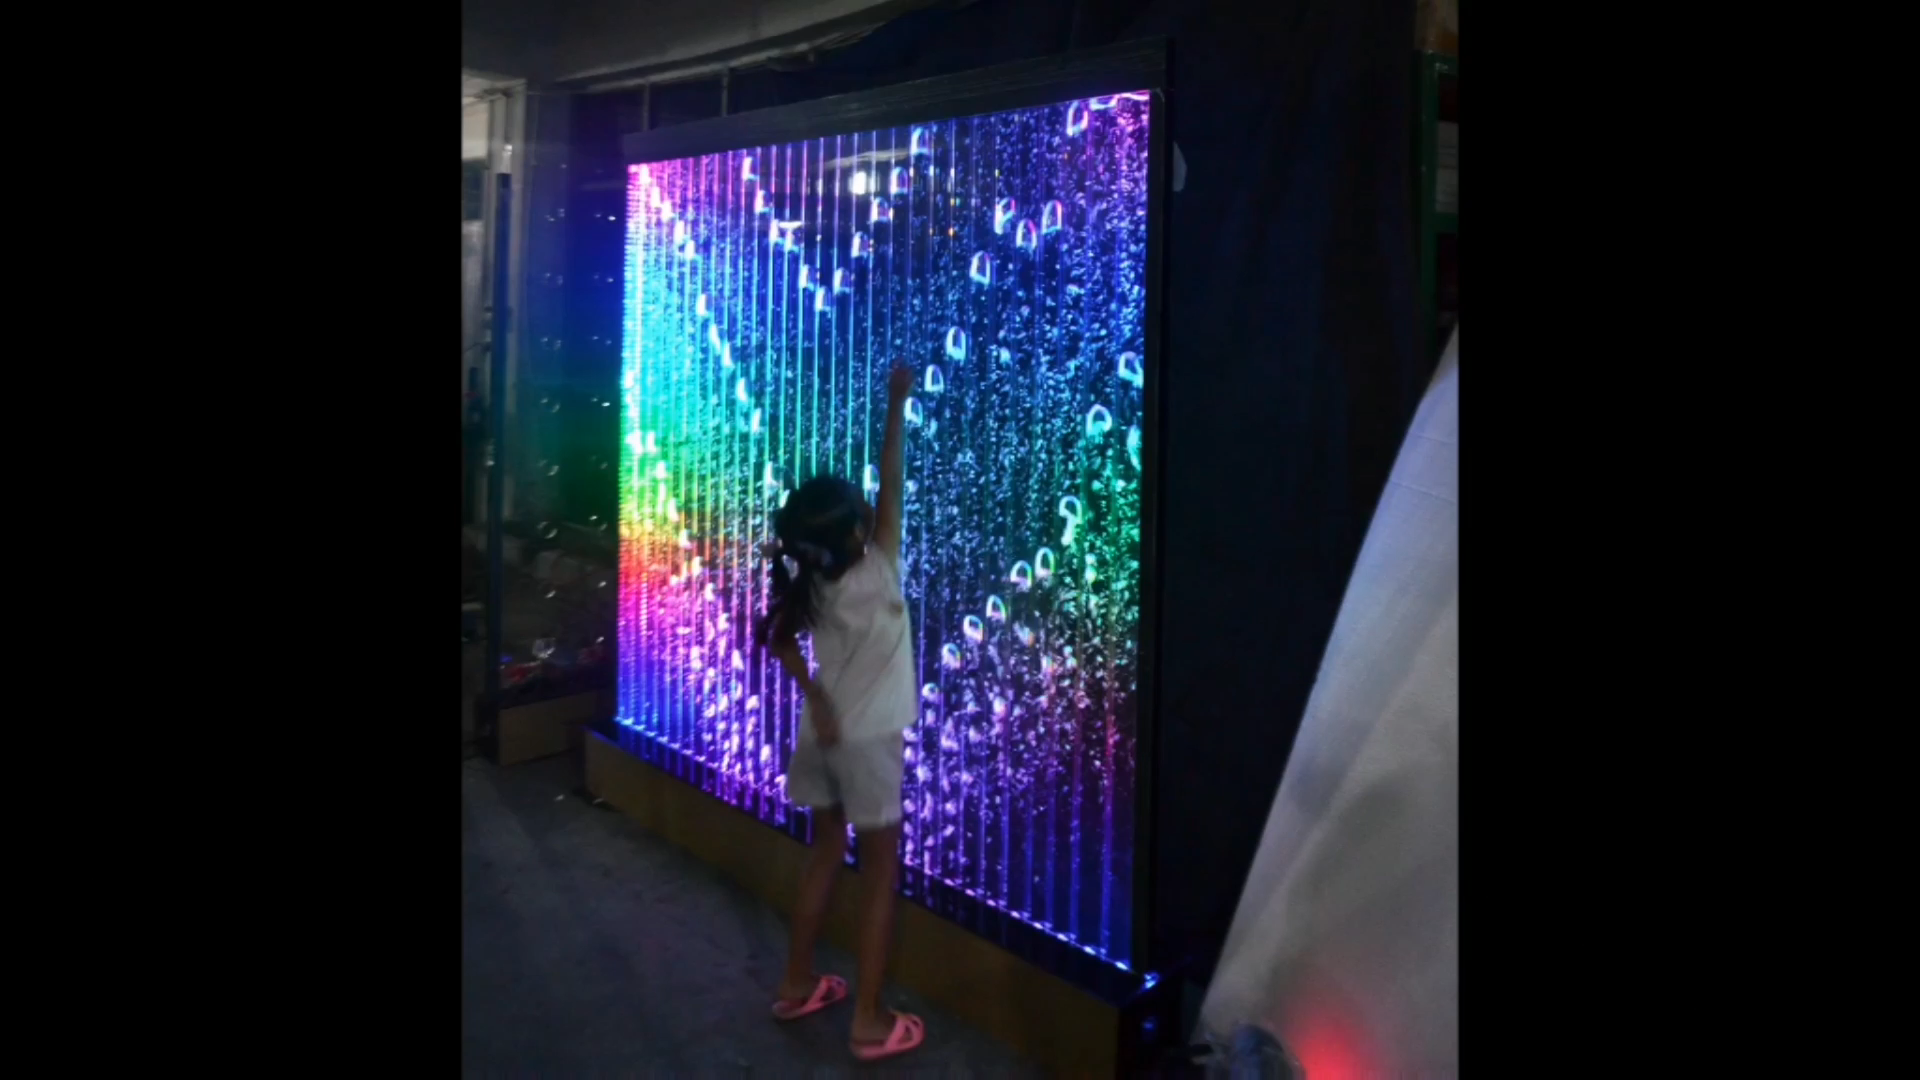 LED אקריליק מפל עומד קיר קישוט מחיצת מסך תכנית ריקודי בועה מים קיר